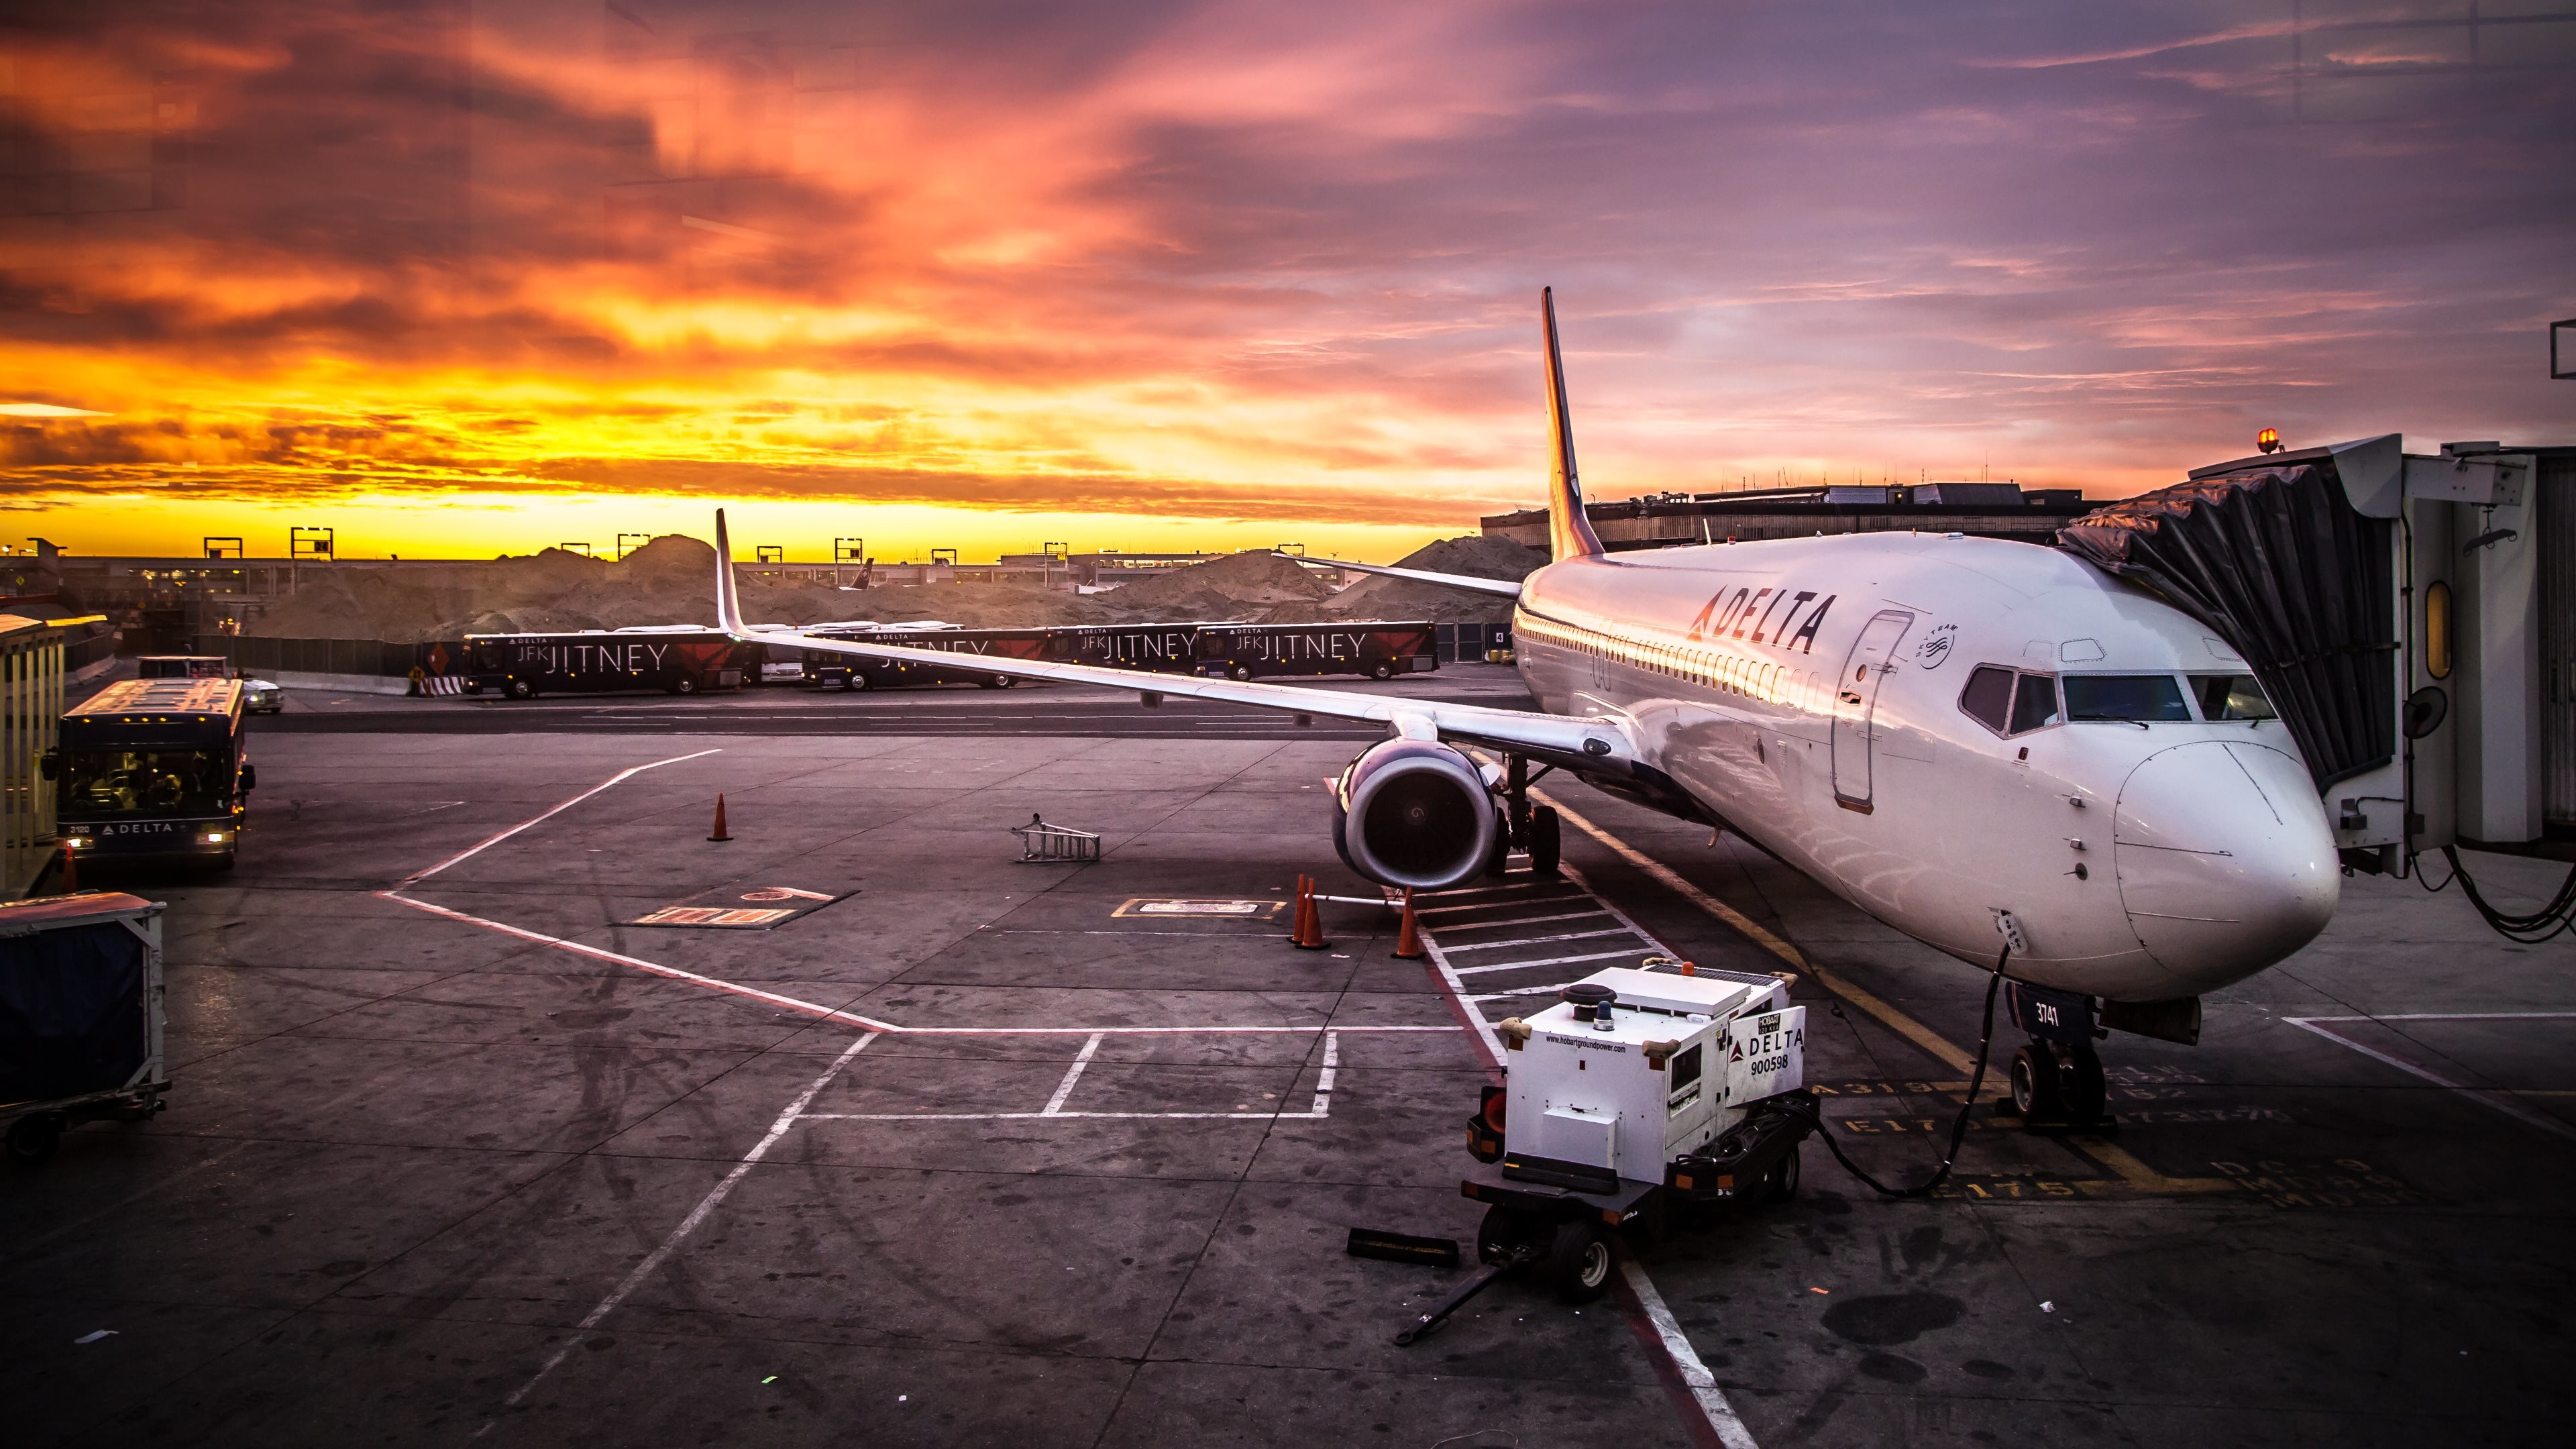 airplane & aircraft wallpapers 3840x2160 ultra hd 4k desktop backgrounds